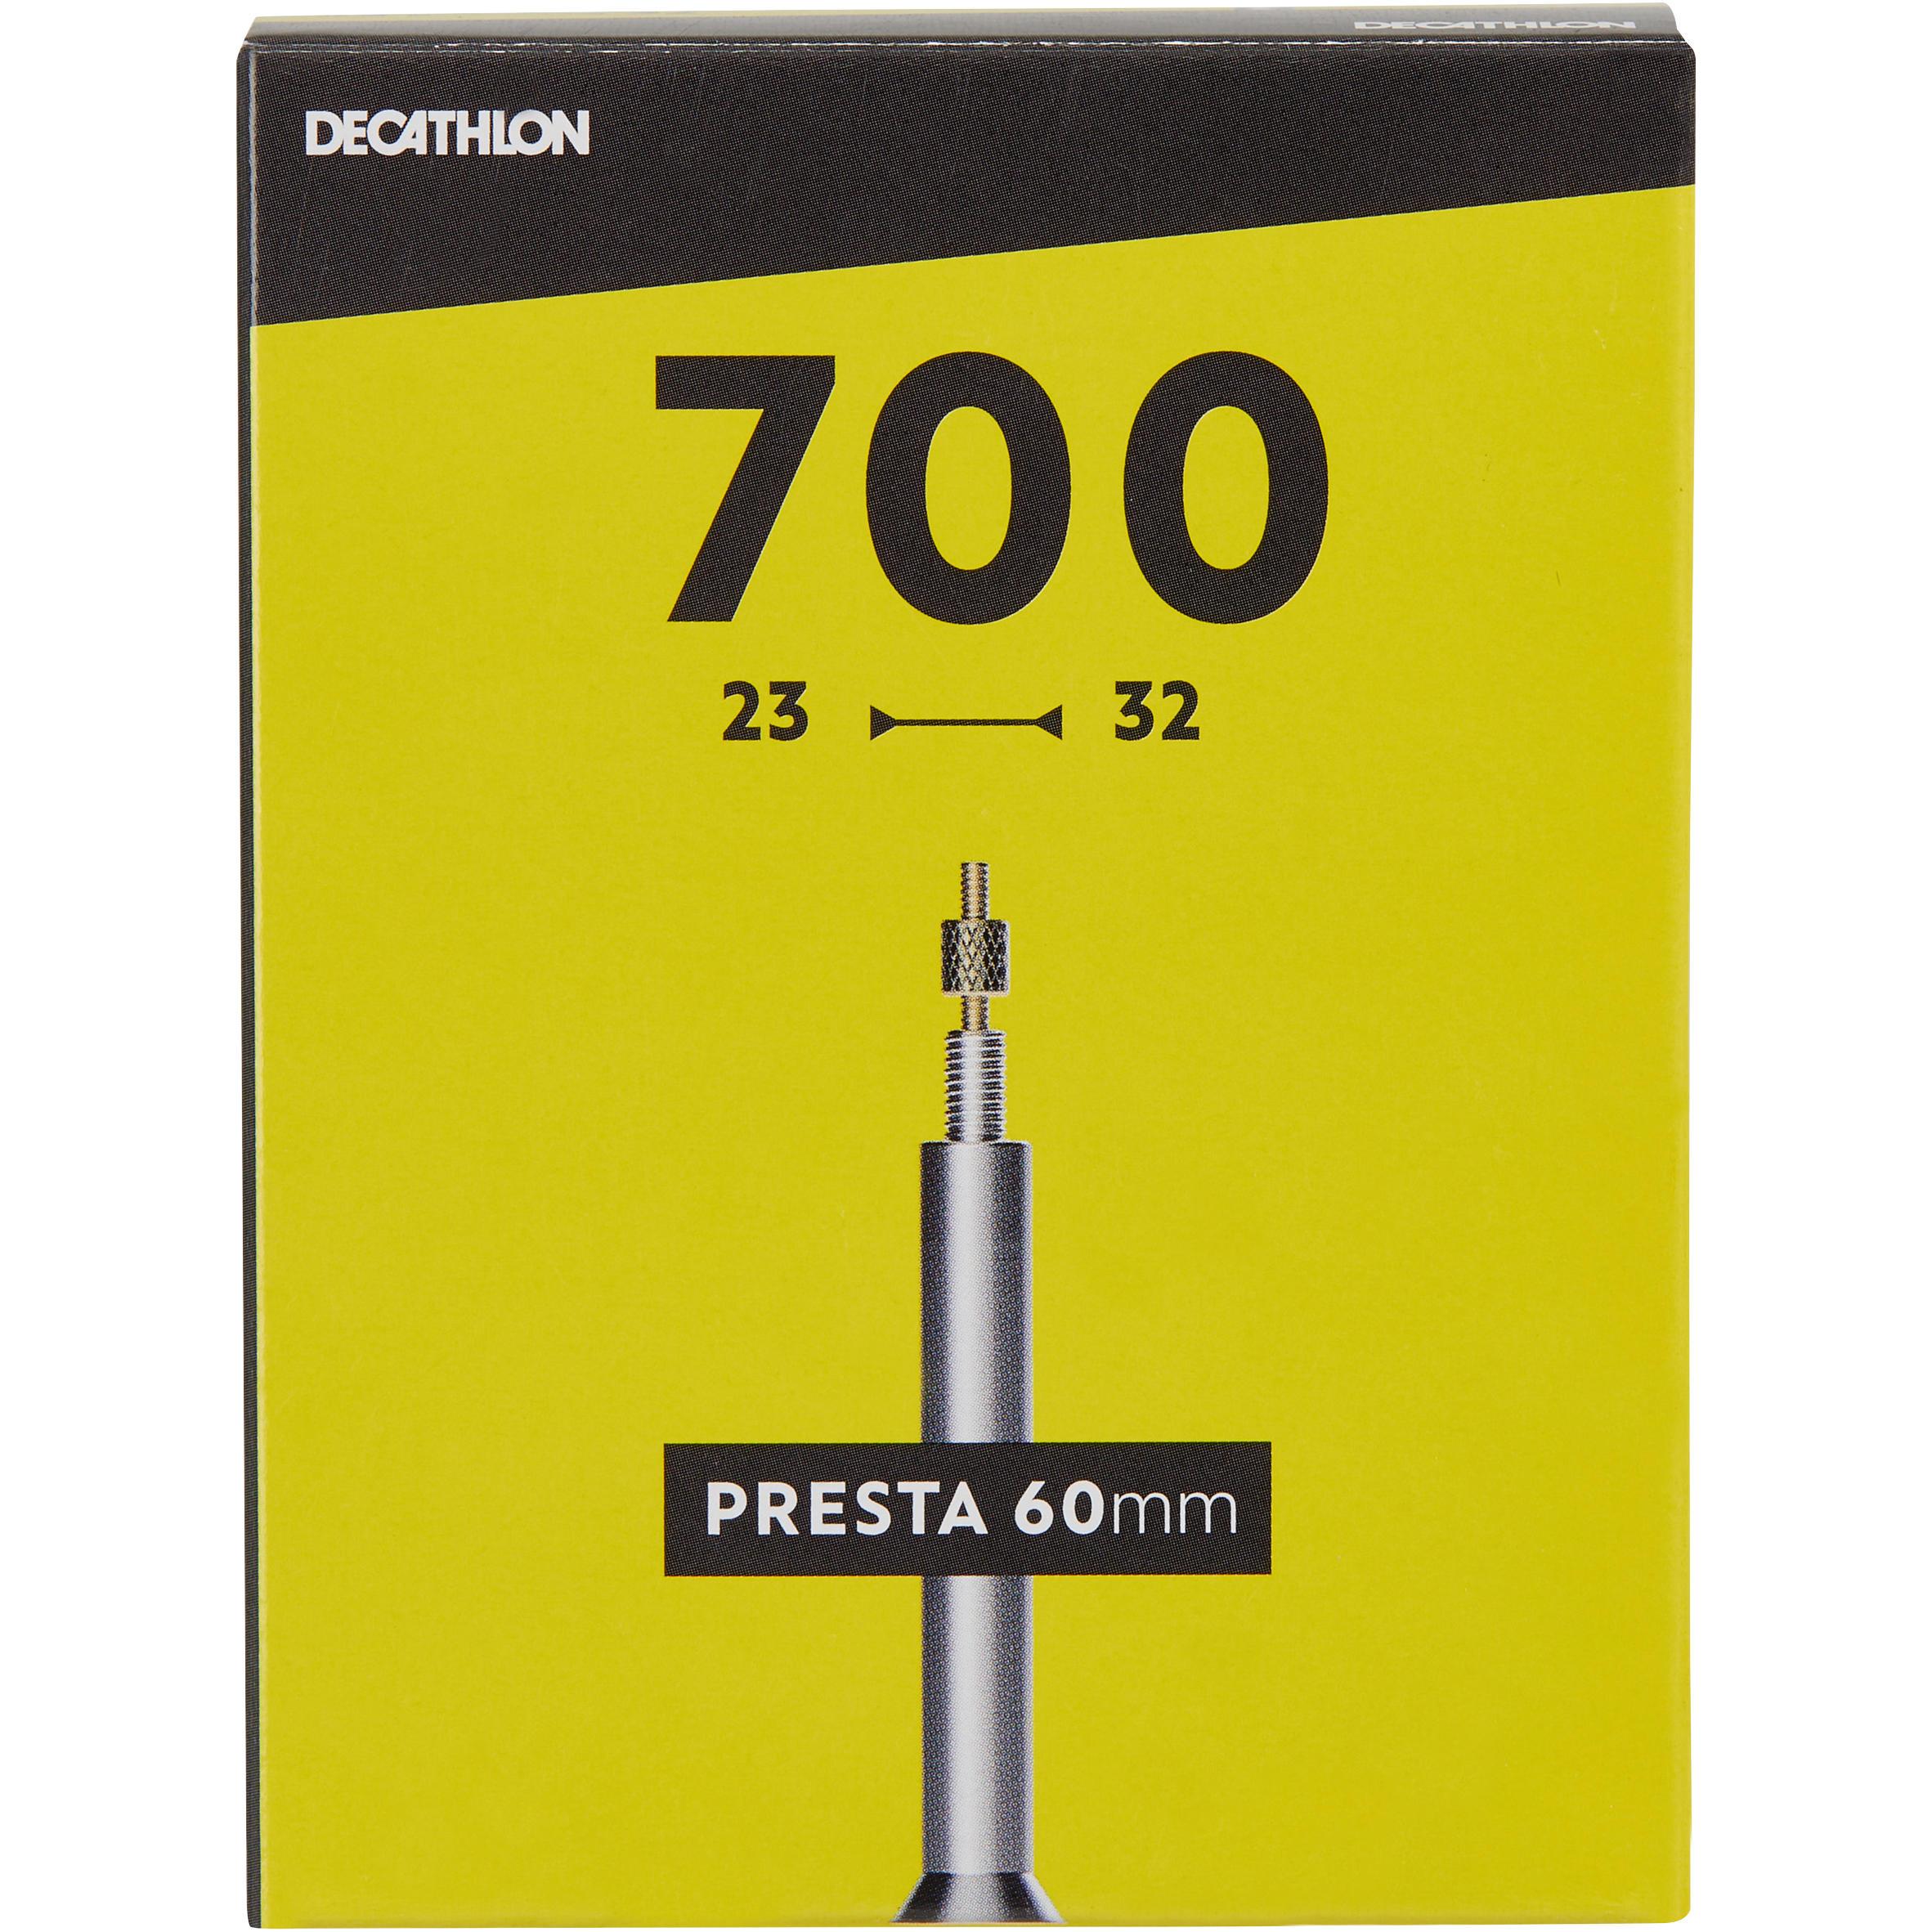 CÁMARA DE AIRE 700x23/32 VÁLVULA PRESTA 60 mm